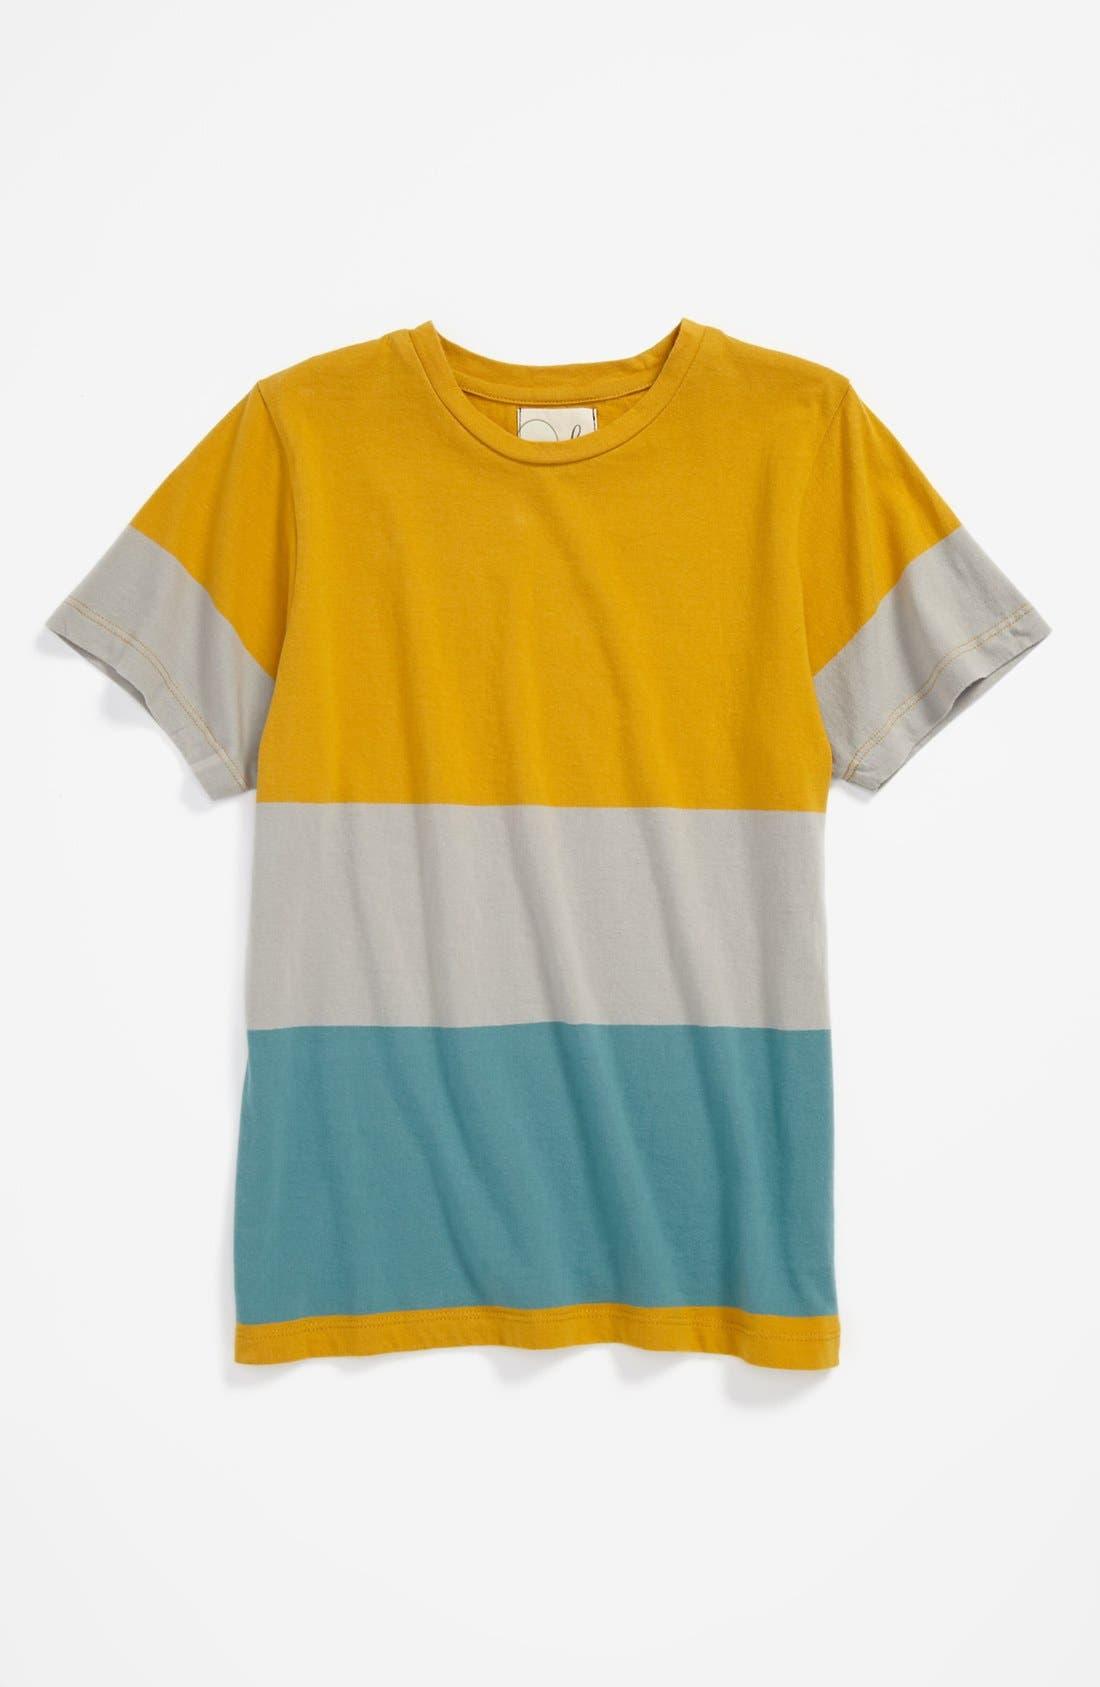 Alternate Image 1 Selected - Peek 'Elliot' T-Shirt (Toddler Boys, Little Boys & Big Boys)